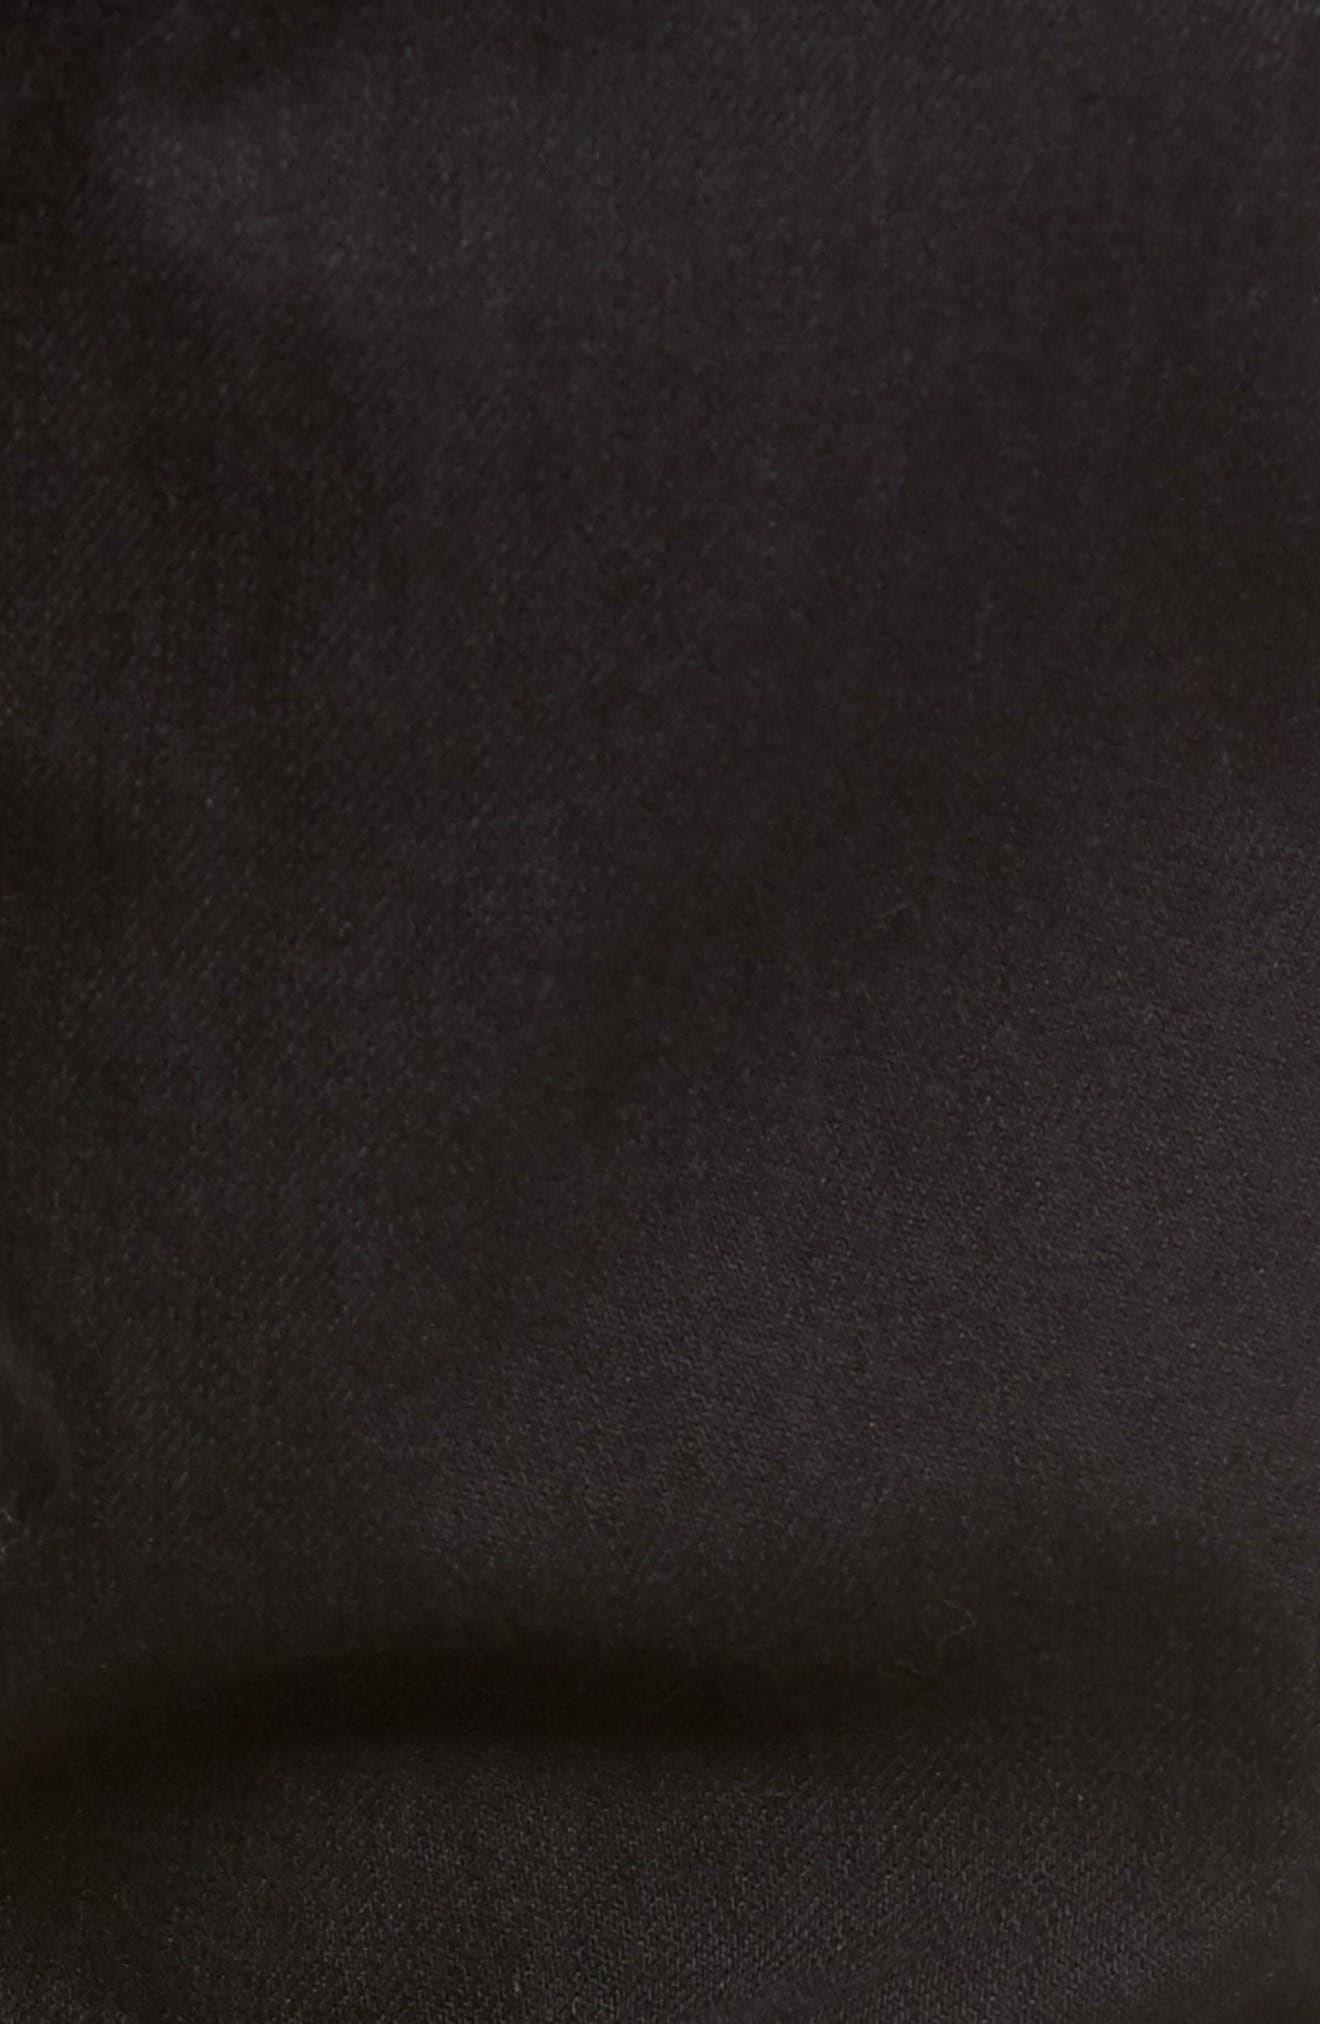 Thavar Skinny Fit Jeans,                             Alternate thumbnail 5, color,                             0679F